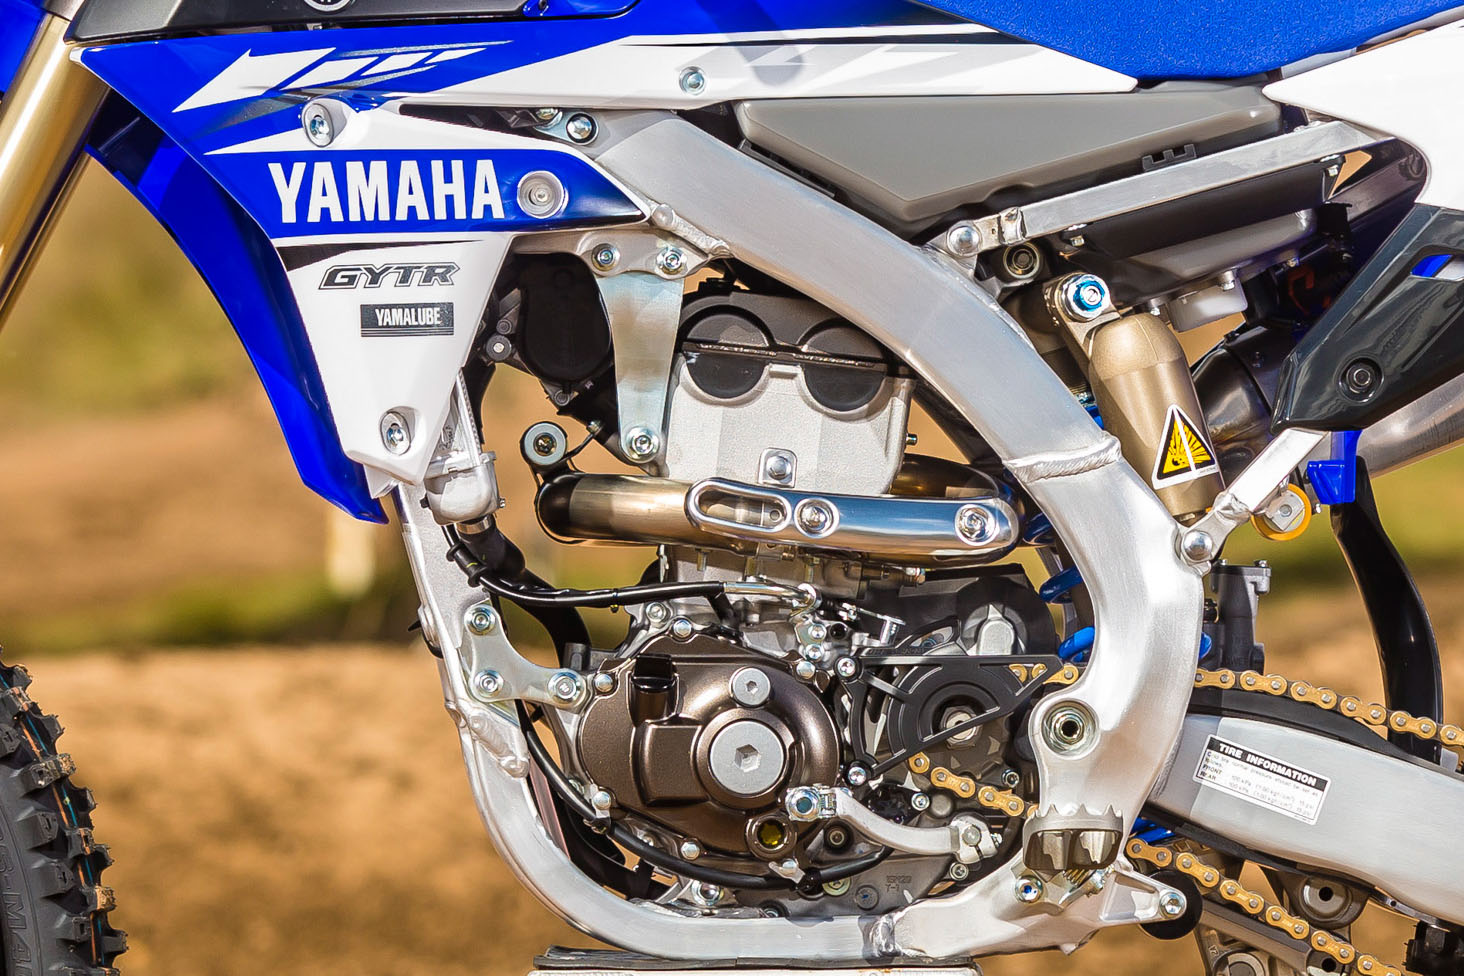 2017 yamaha yz250f major revisions bike review for 2017 yamaha yz250f